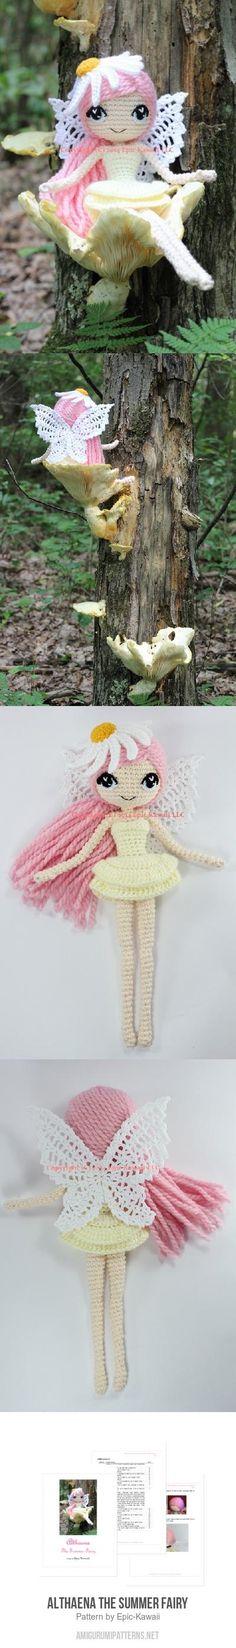 Althaena the Summer Fairy amigurumi pattern